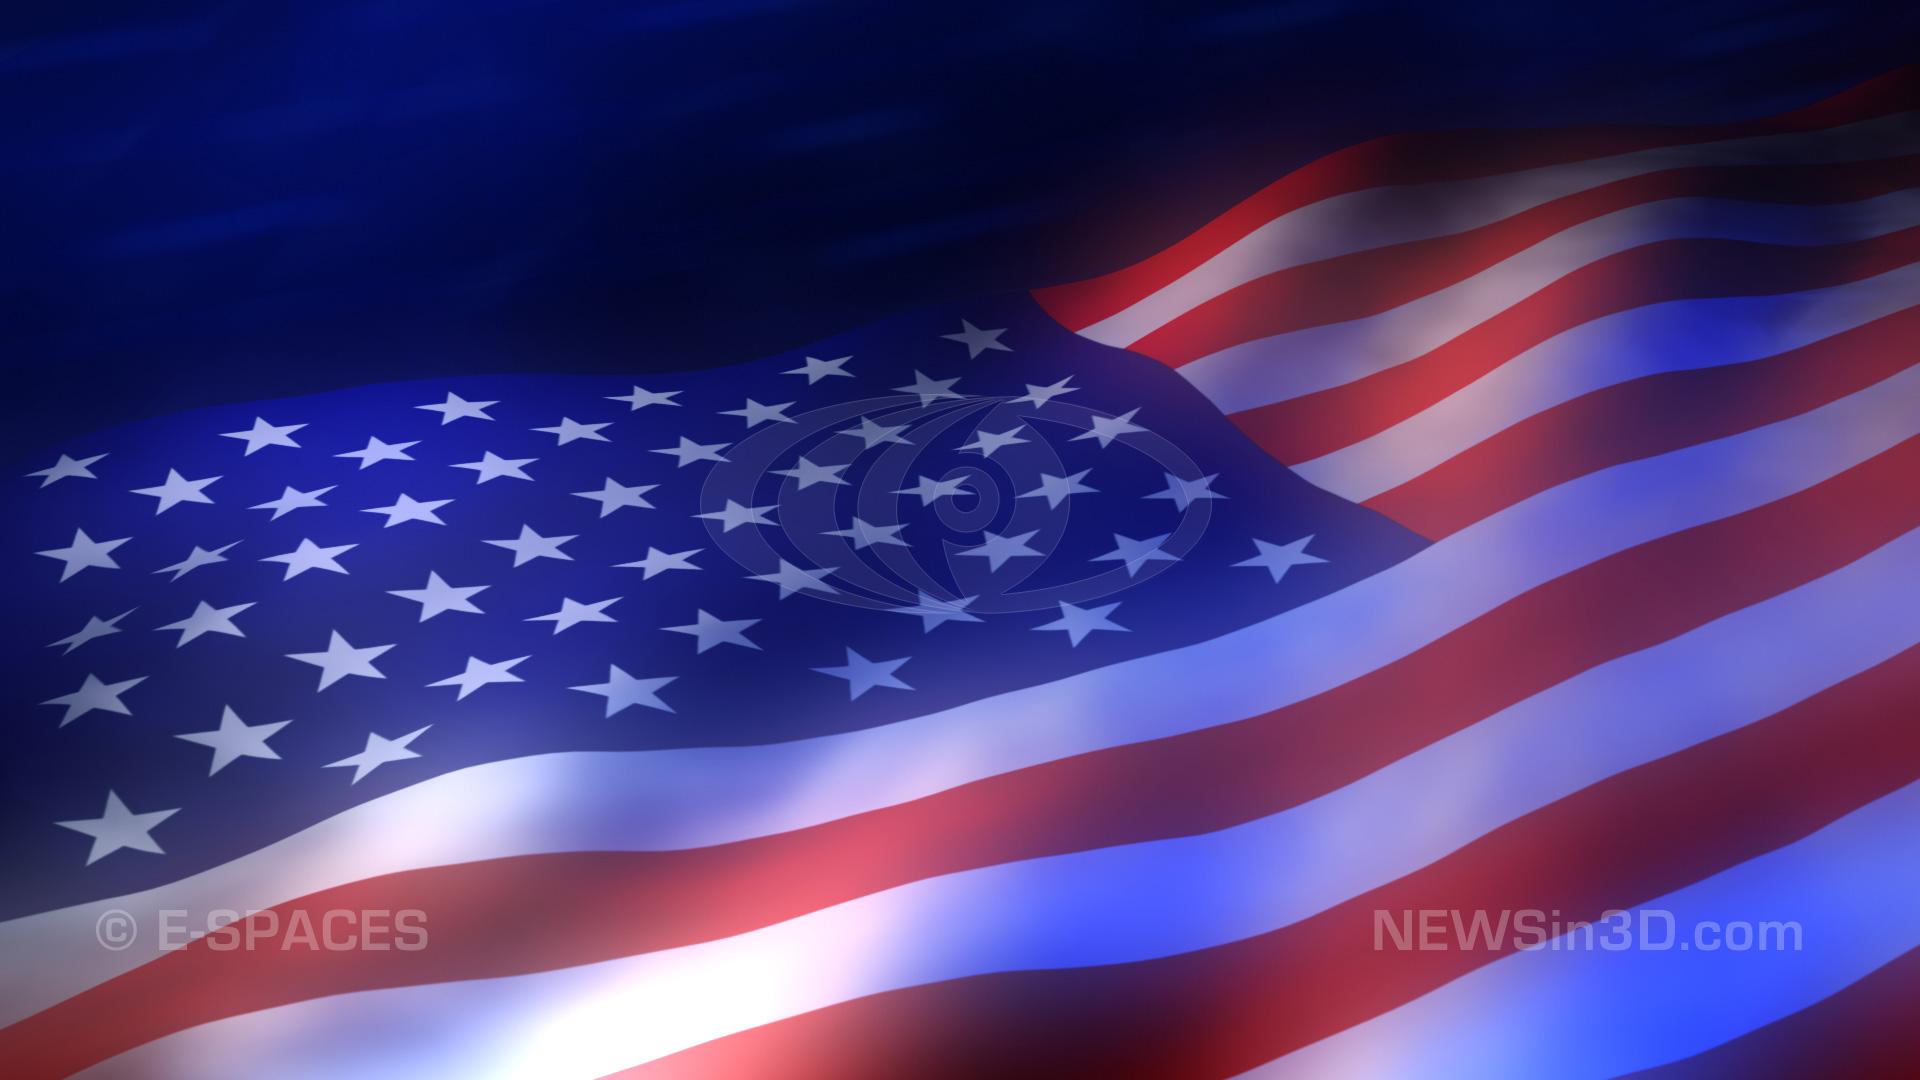 American flag background hd wallpaper - American flag hd ...